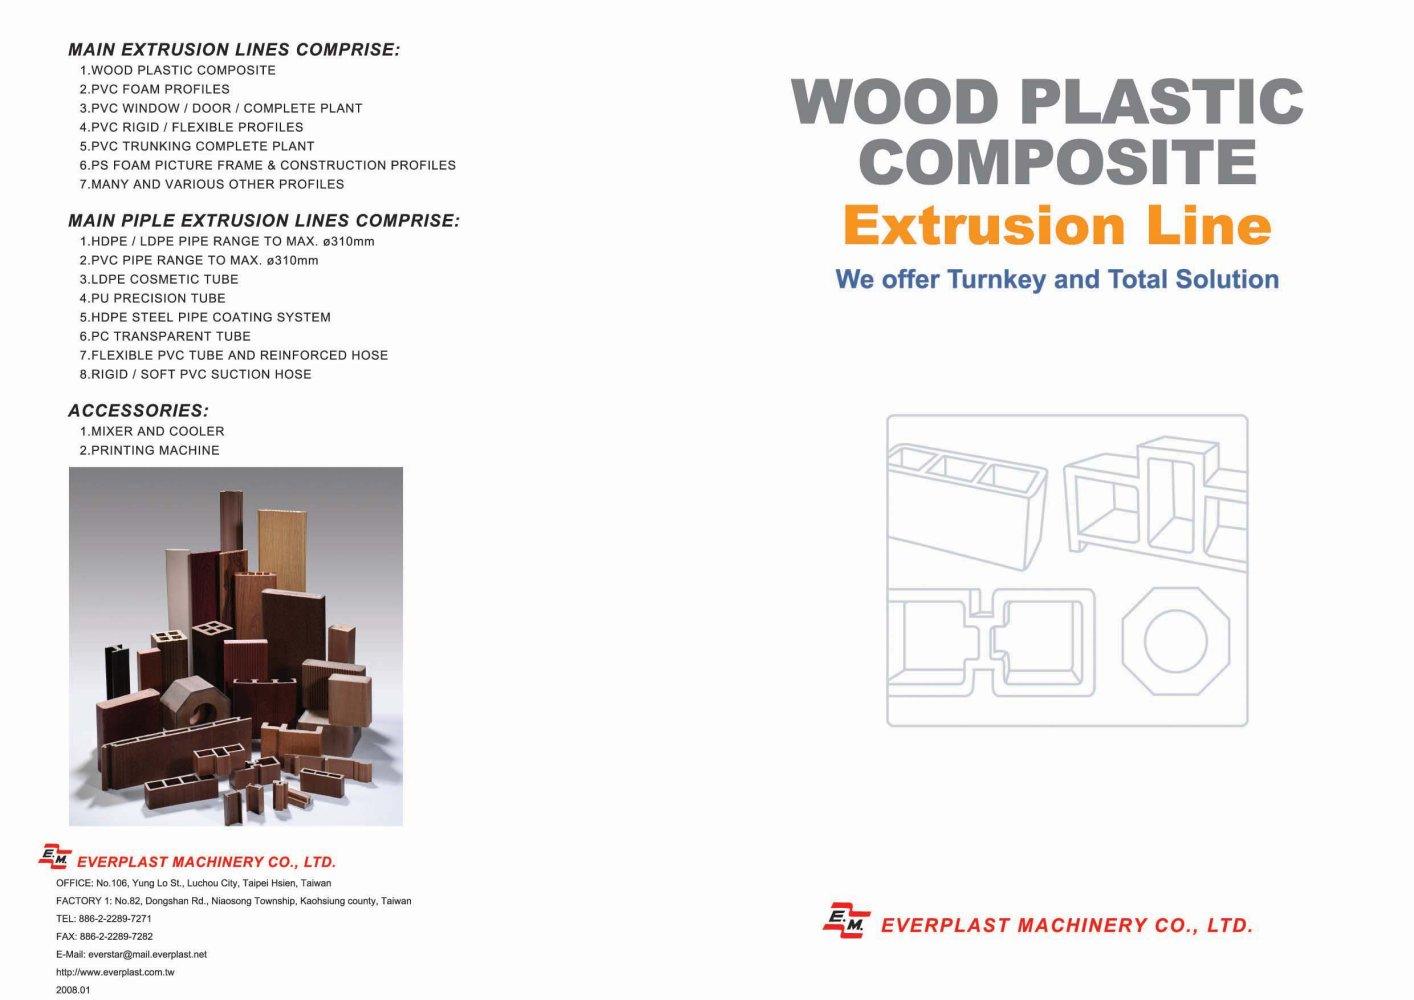 wood plastic composite extrusion line - Everplast Machinery Co ...